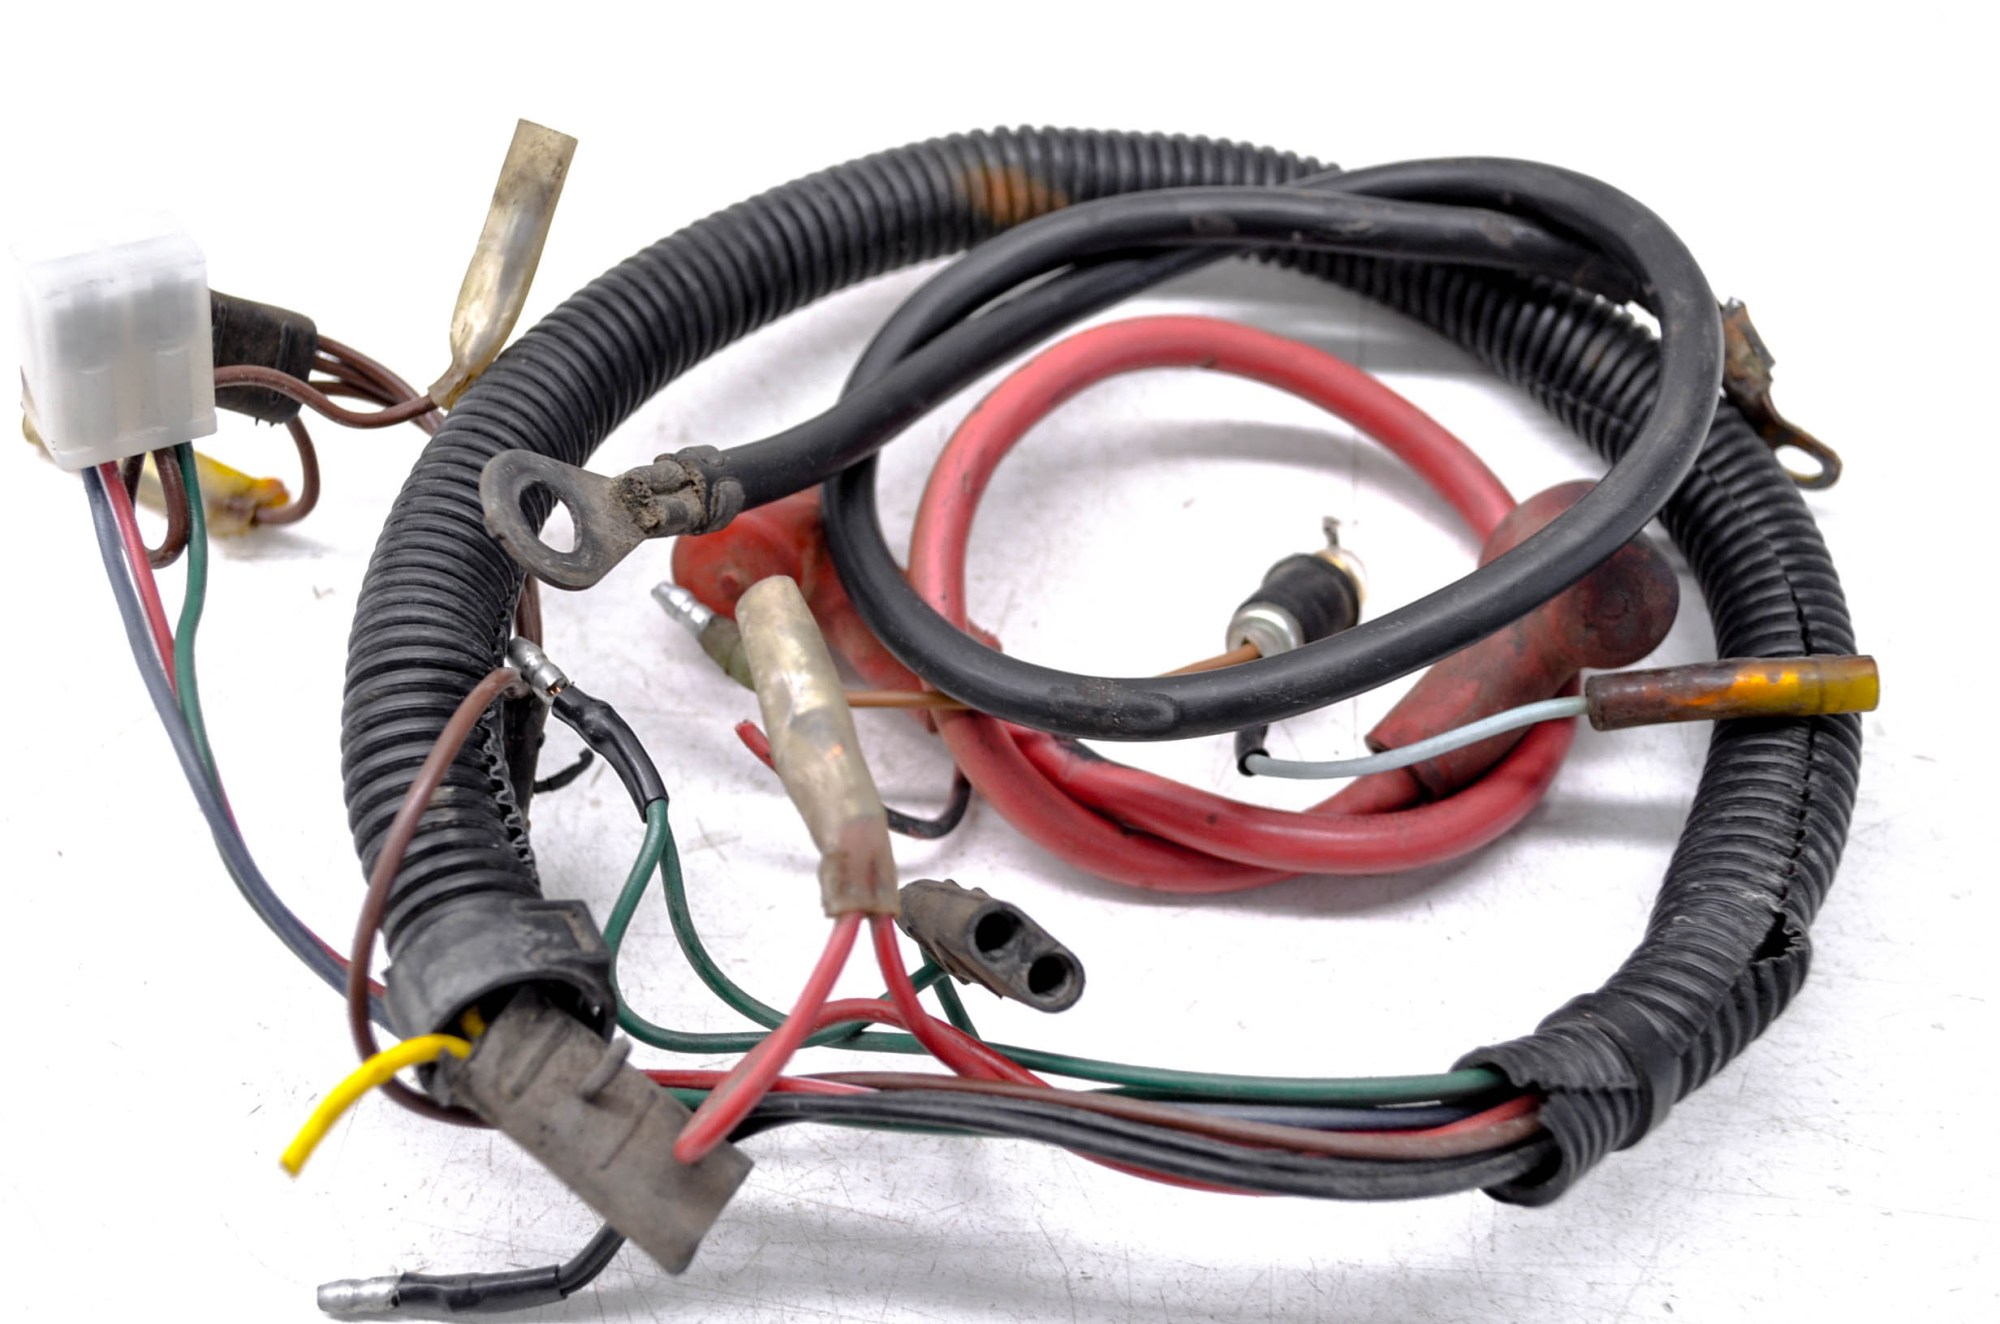 hight resolution of 2003 polaris trail boss wiring harness wiring diagram library rh 3 amper shoppen de 2003 polaris trail boss manual 2003 polaris trail boss 330